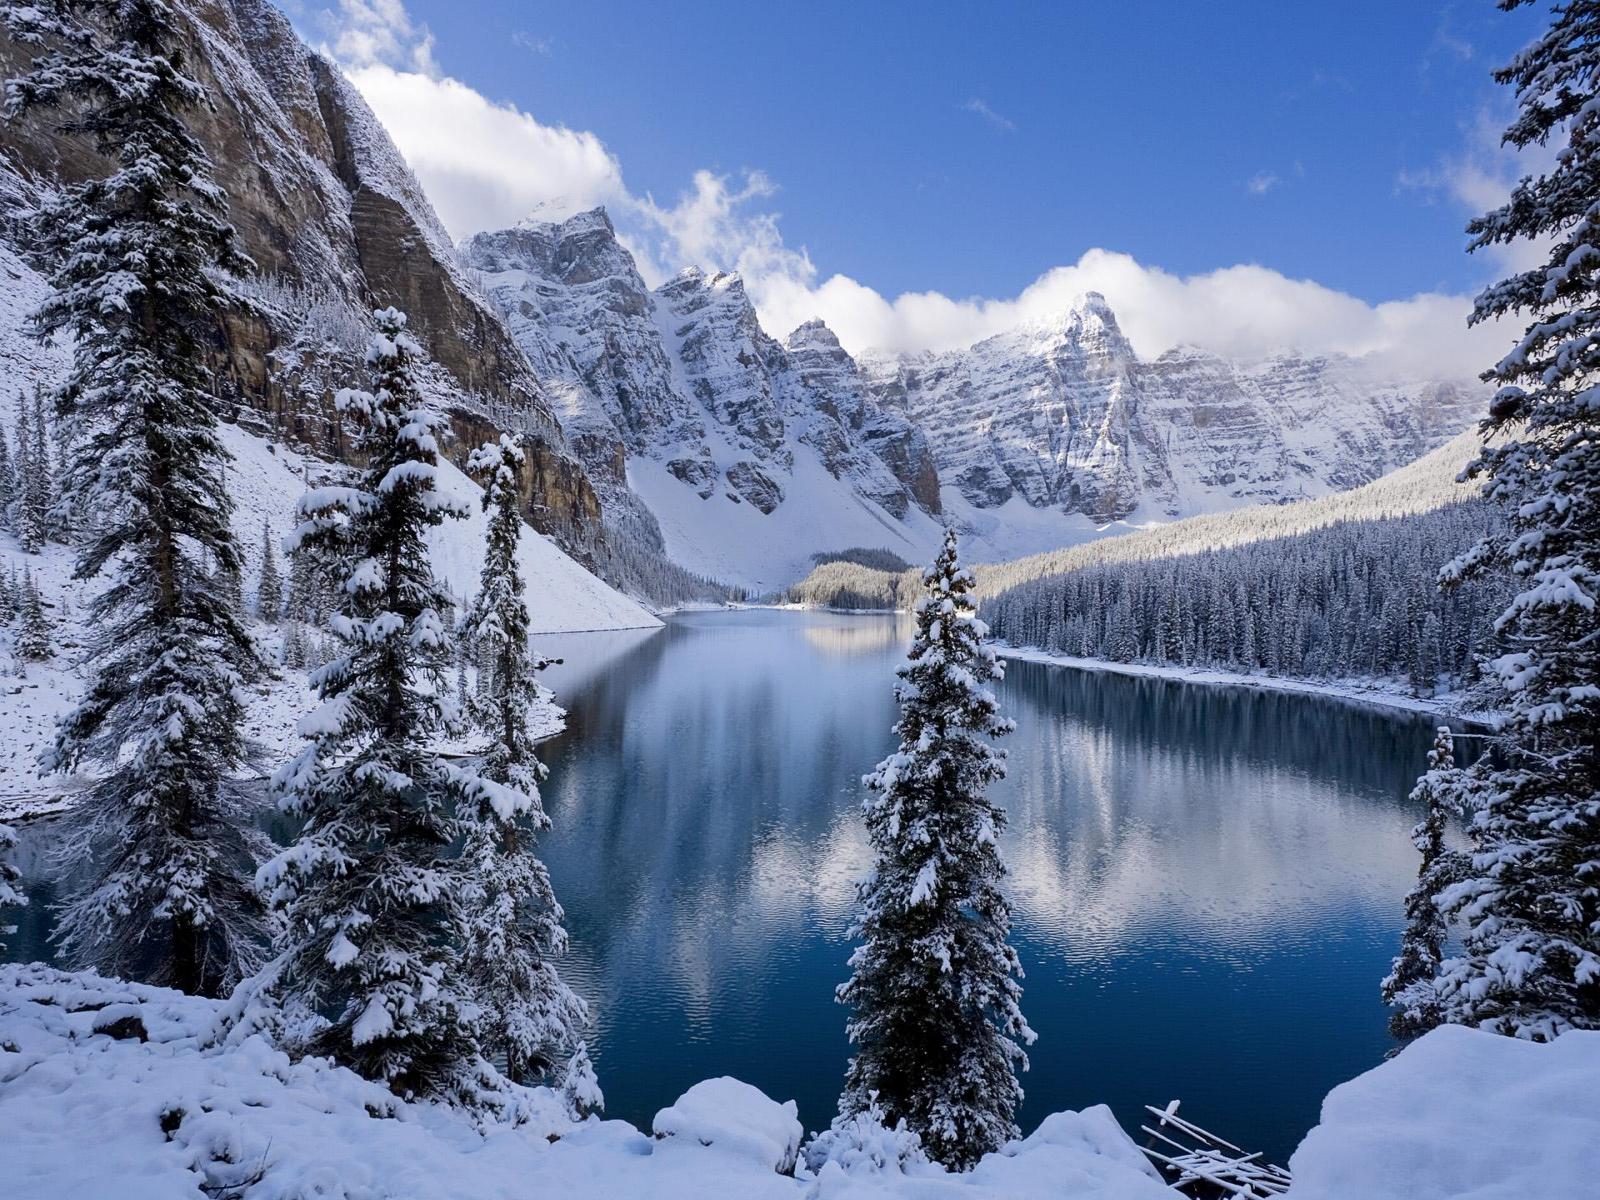 freephotoznetwallpapersSeasonsWinterwinter snow desktop wallpaper 1600x1200